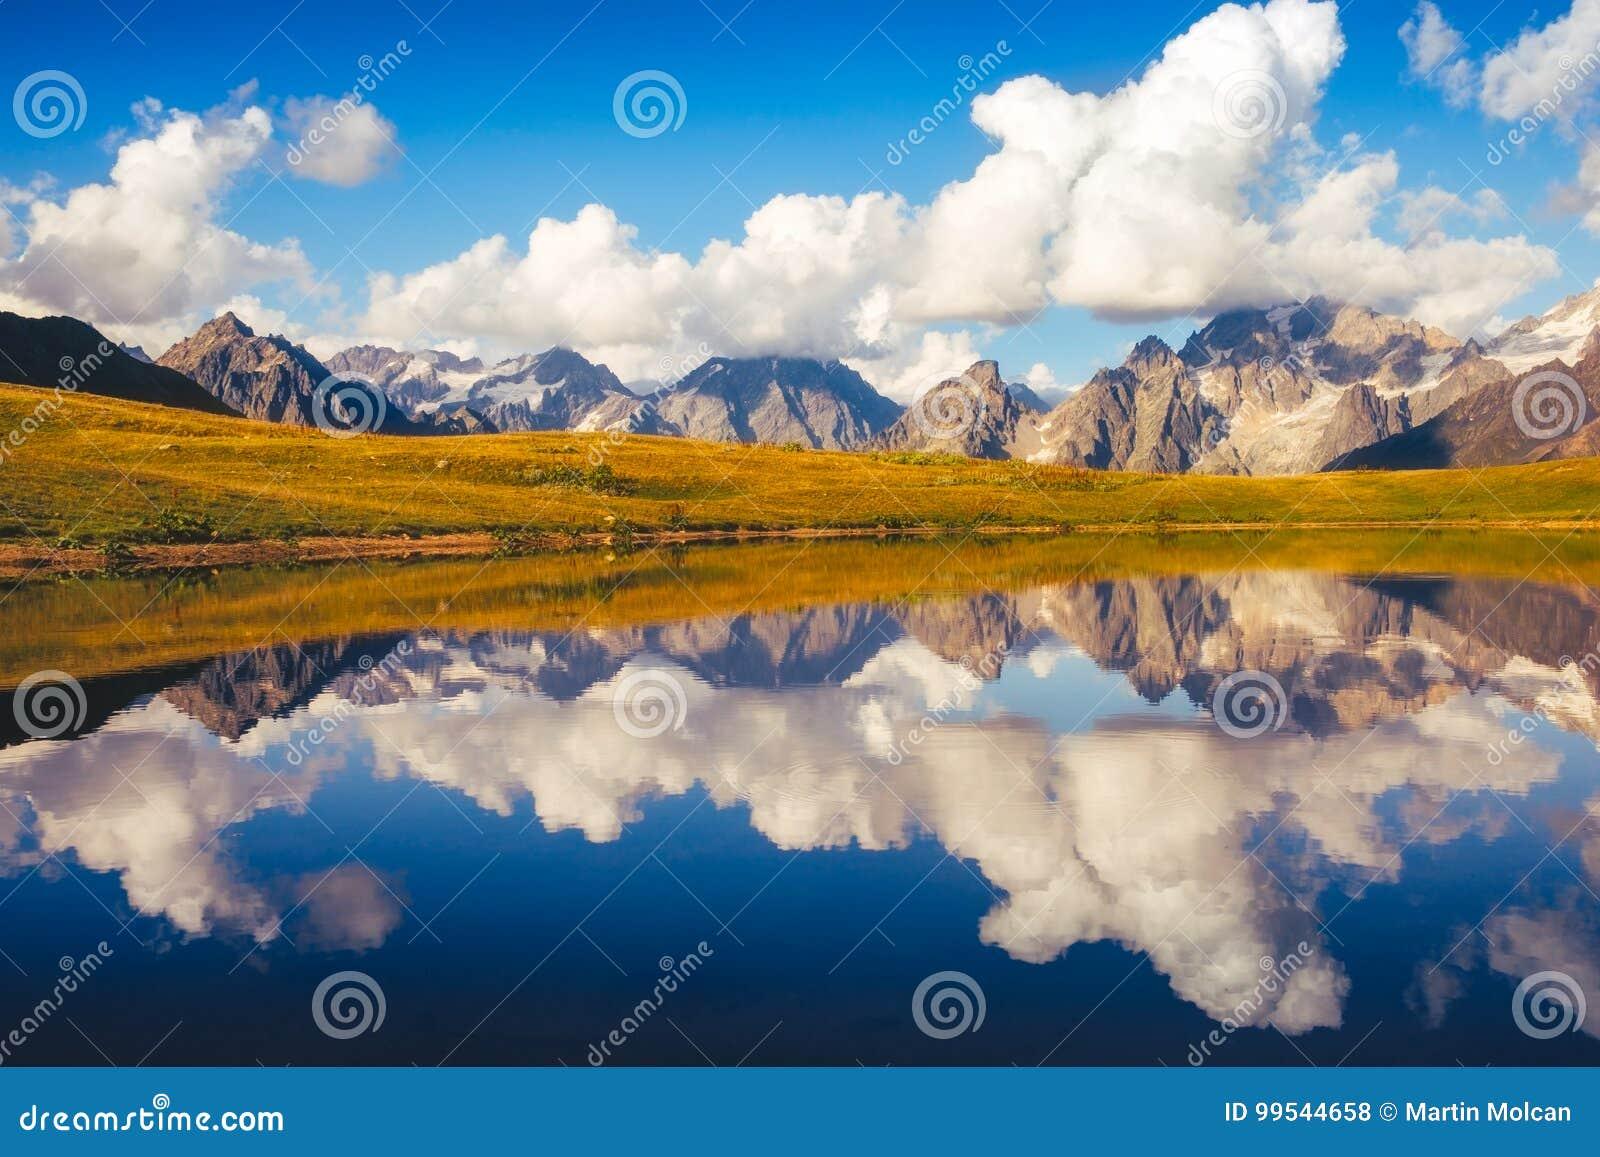 Beautiful mountain landscape view of Koruldi lakes in Svaneti national park